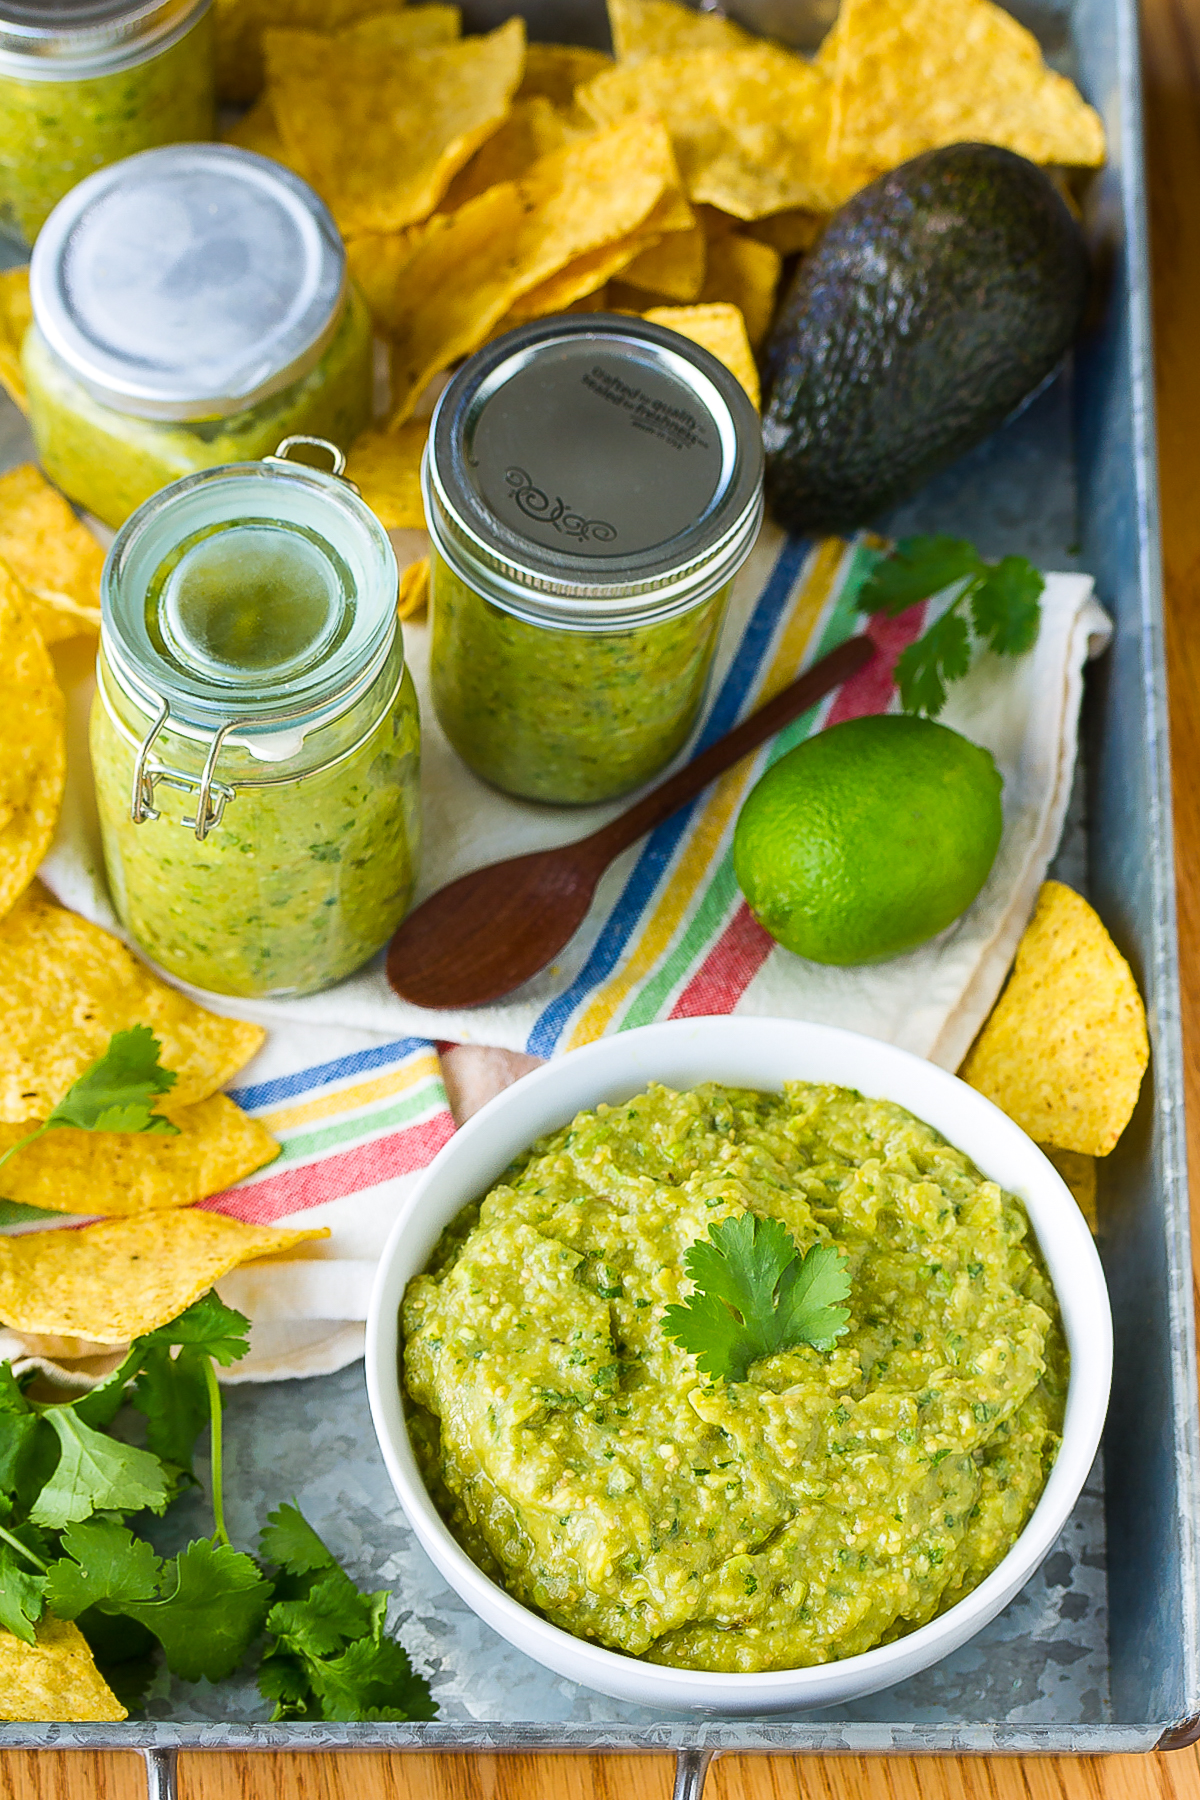 Creamy Avocado Salsa Verde Recipe #ASpicyPerspective #homemade #salsa #salsaverde #verde #avocado #tomatillo #best #summer #fresh